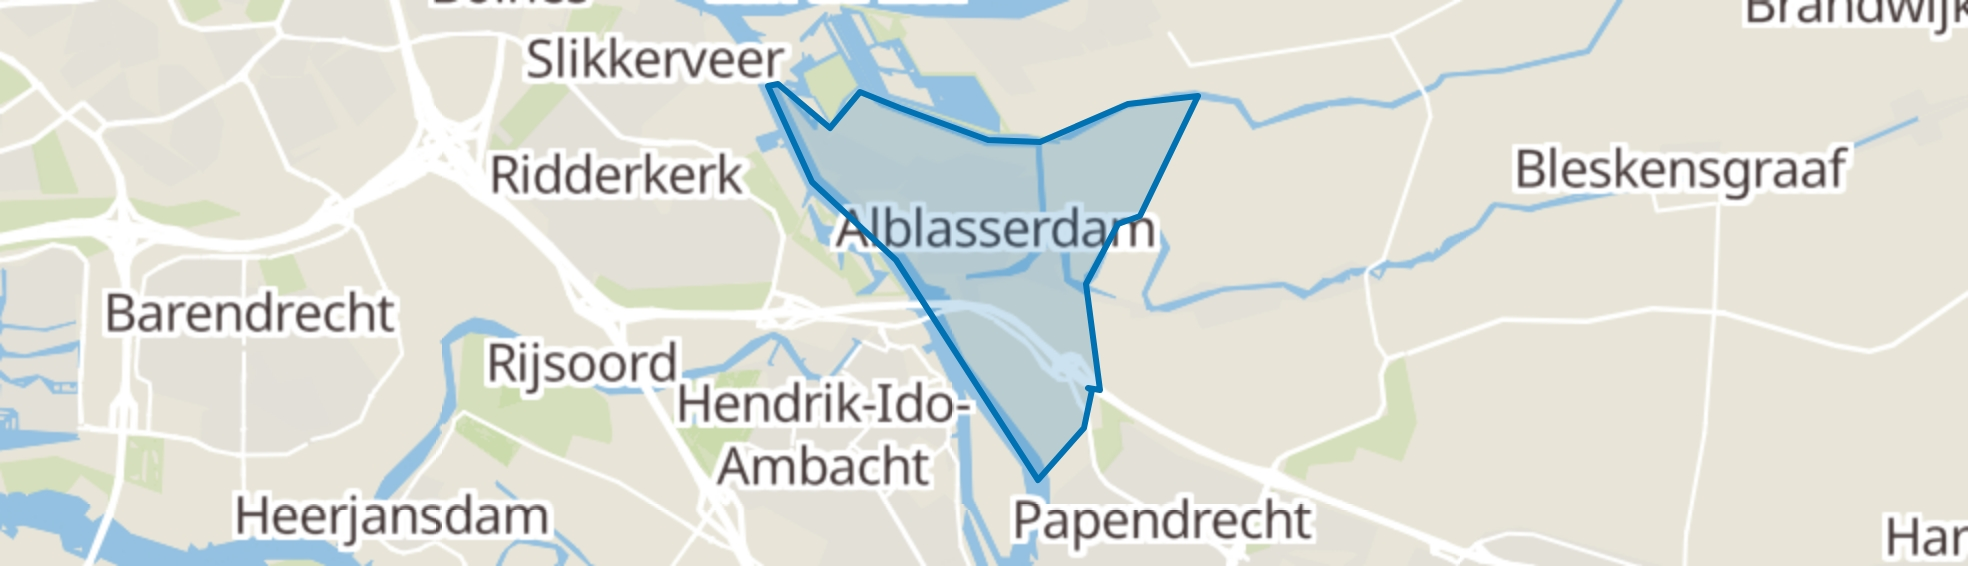 Alblasserdam map